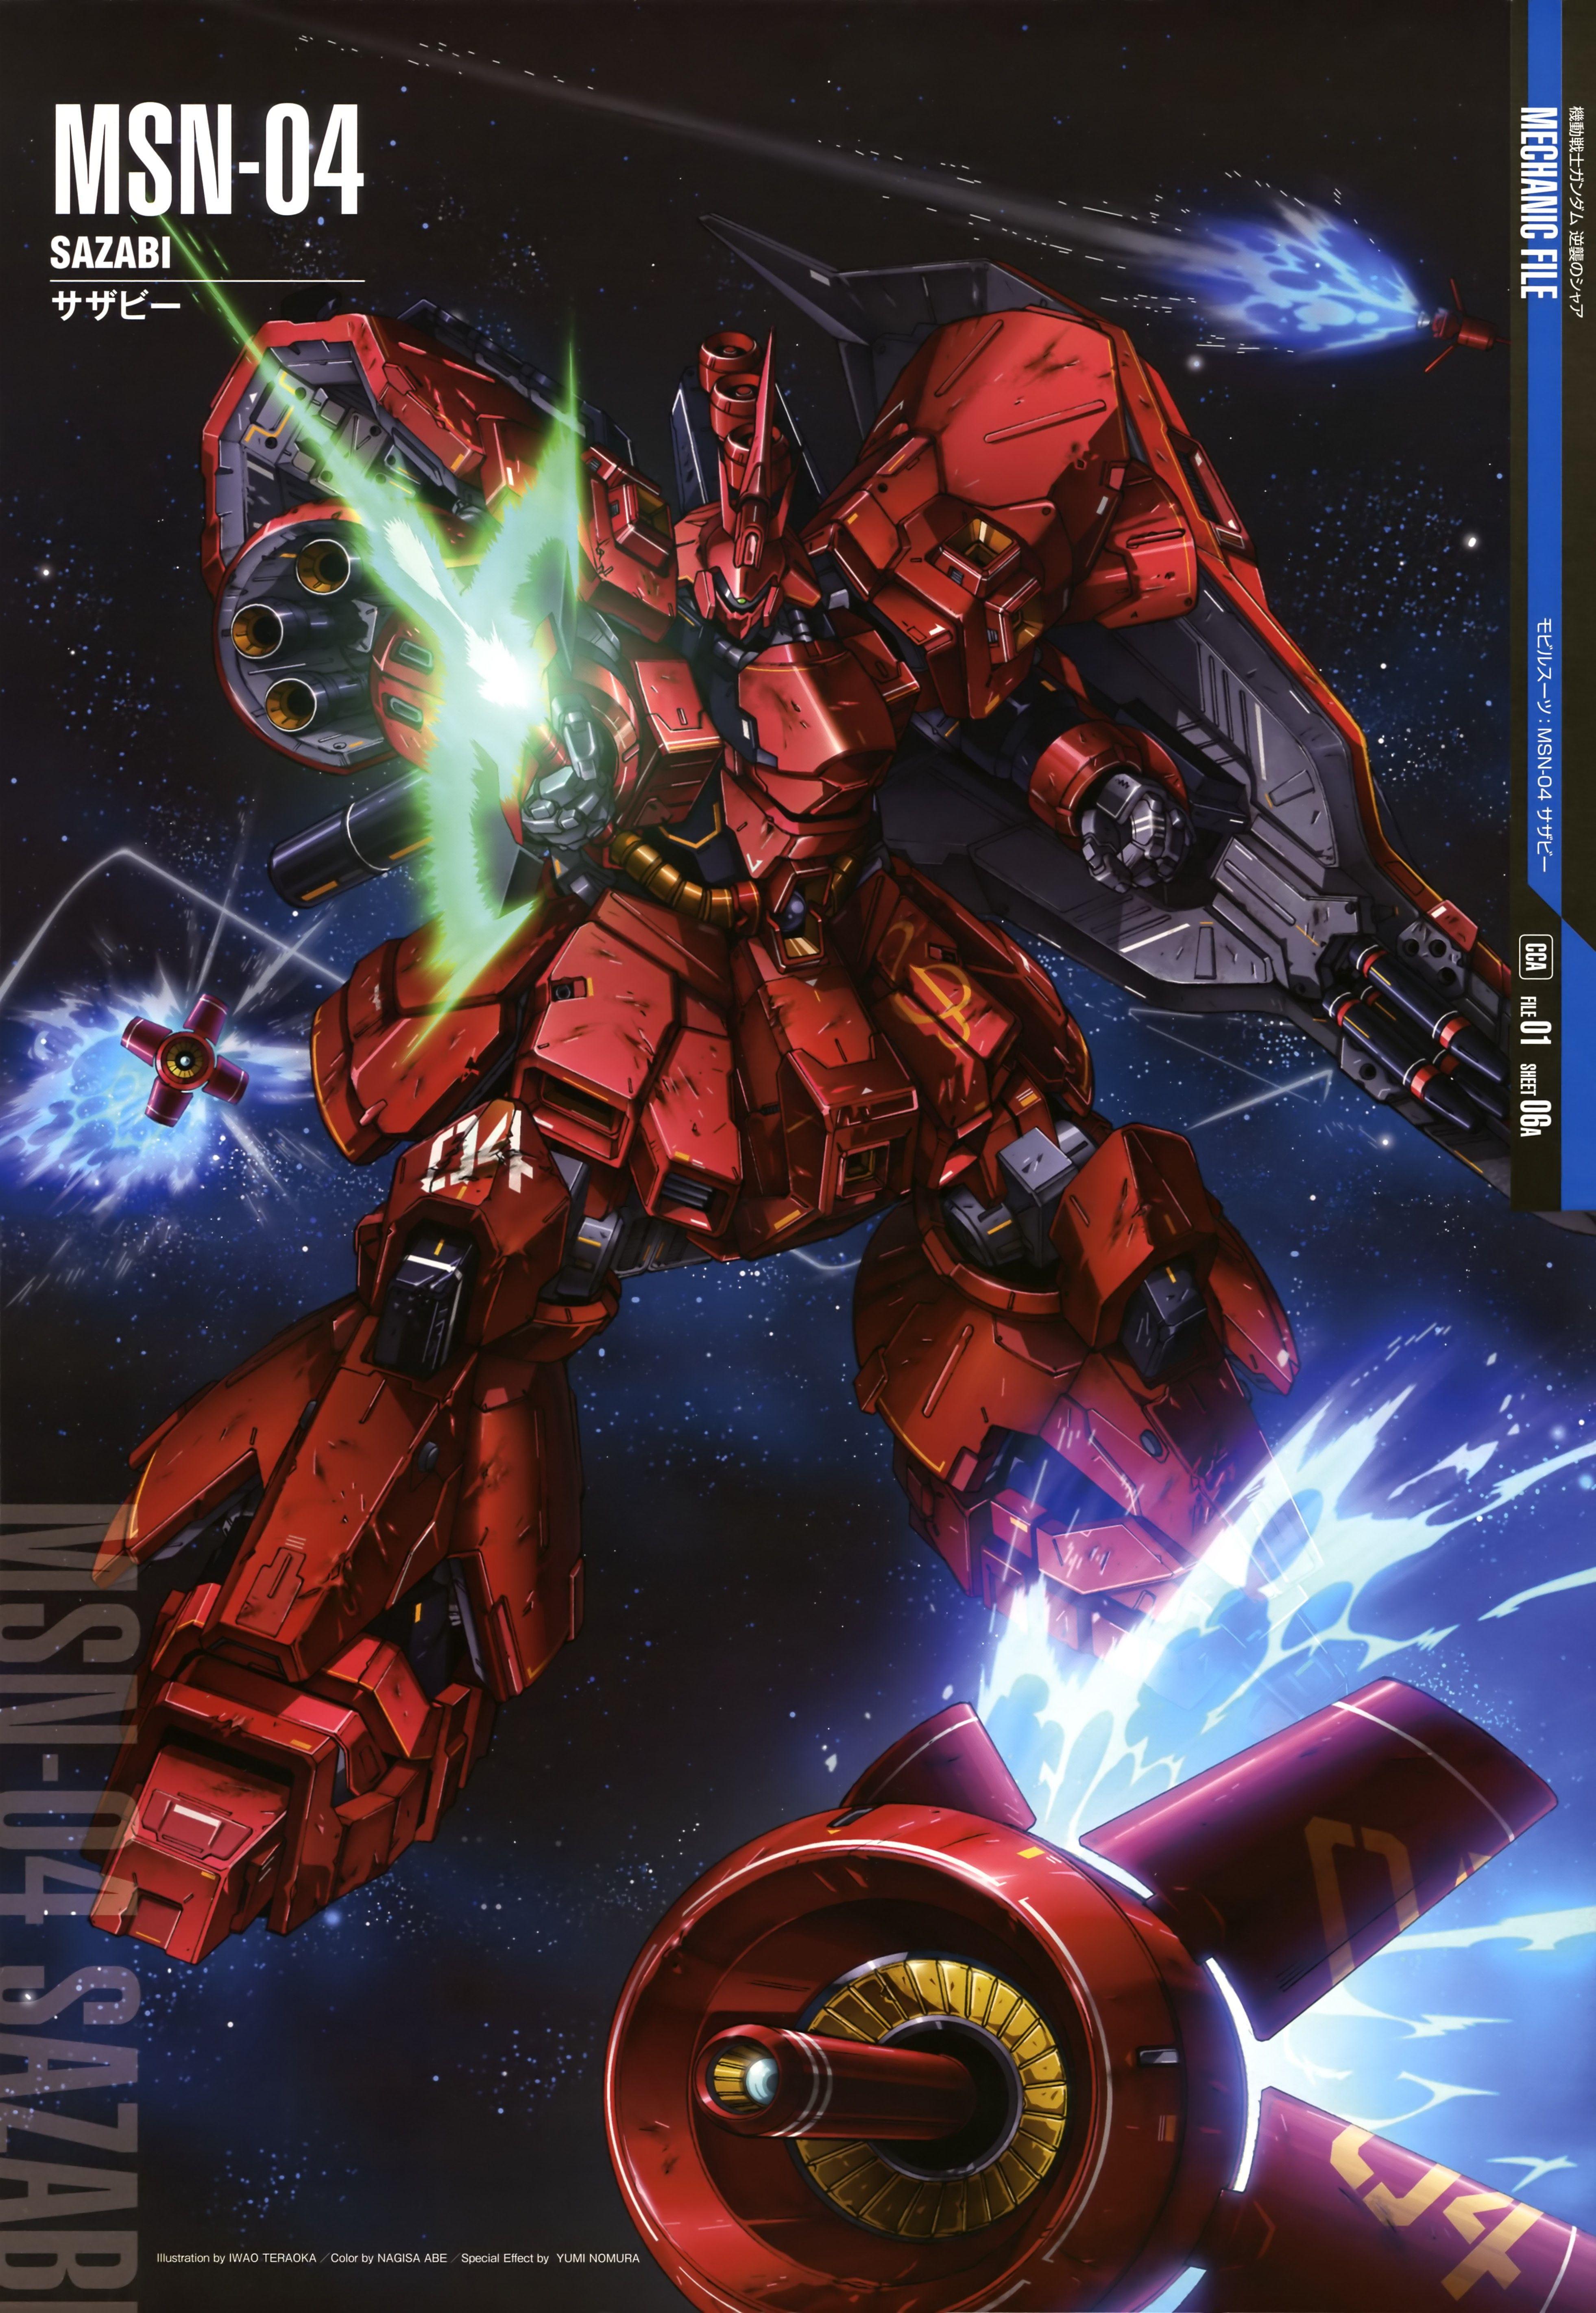 Anime 3924x5686 Gundam Robot Mobile Suit Gundam Char S Counterattack Universal Century Space Mobile Suit Gundam Gundam Wallpapers Gundam Art Gundam